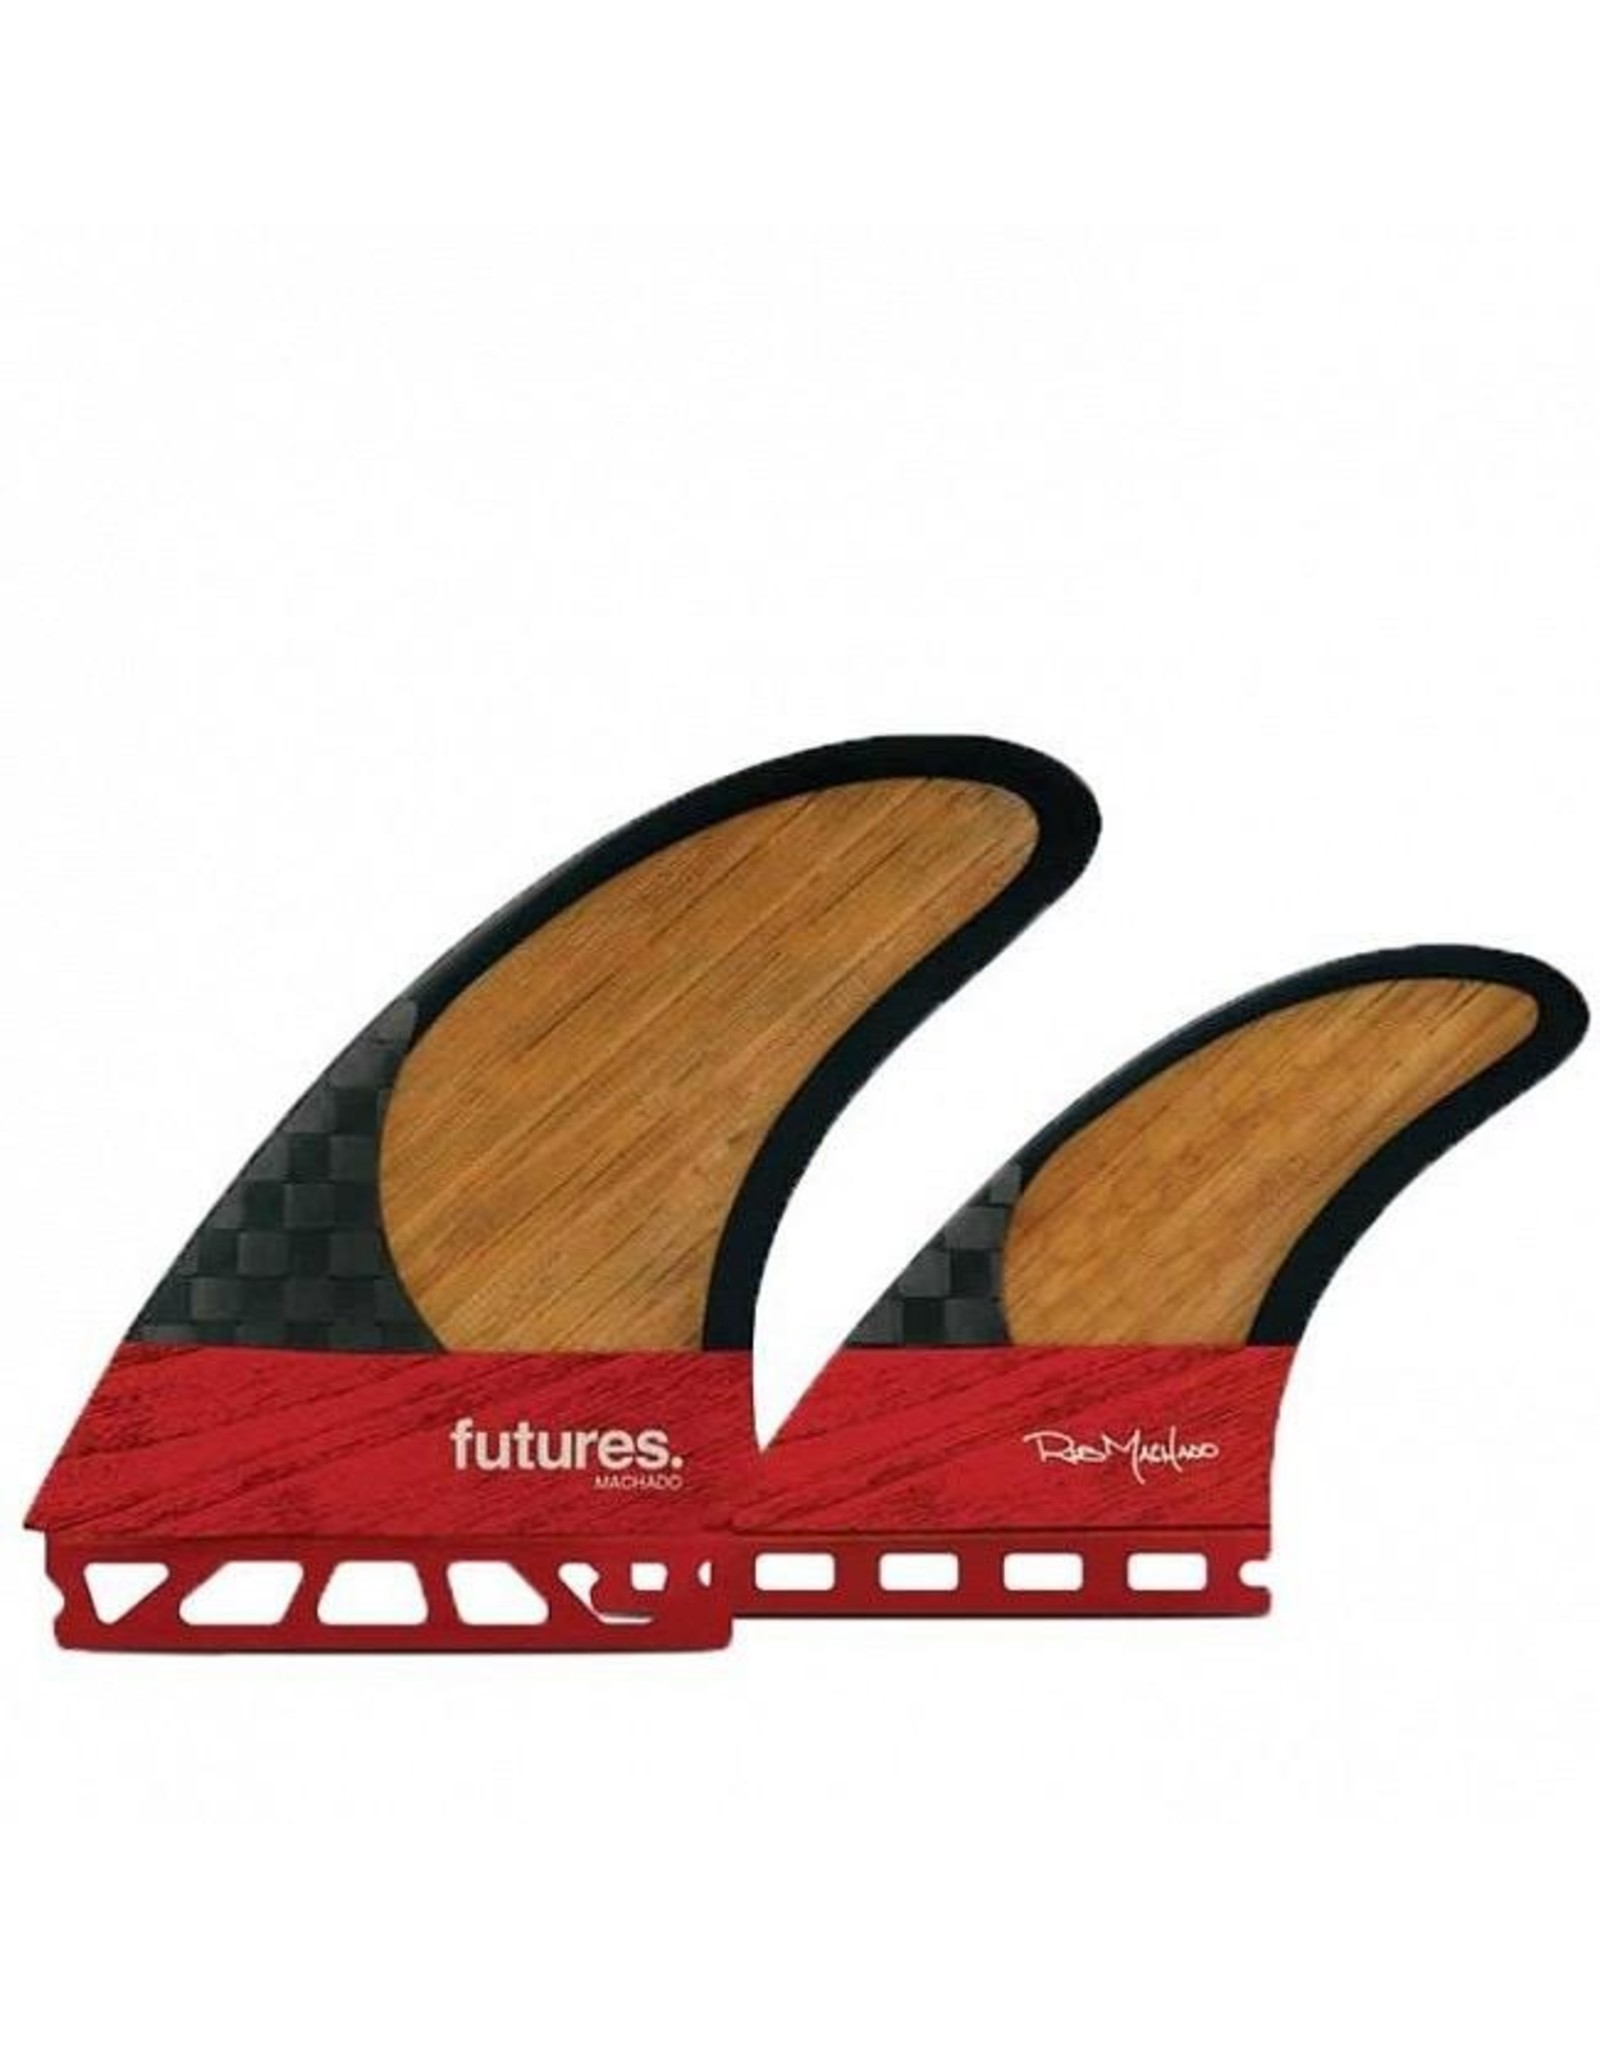 Future Fins Futures 3Fin ROB MACHADO TWIN 2+1 Blackstix 3.0 - Carbon/Bamboo - M (65kg - 88kg)